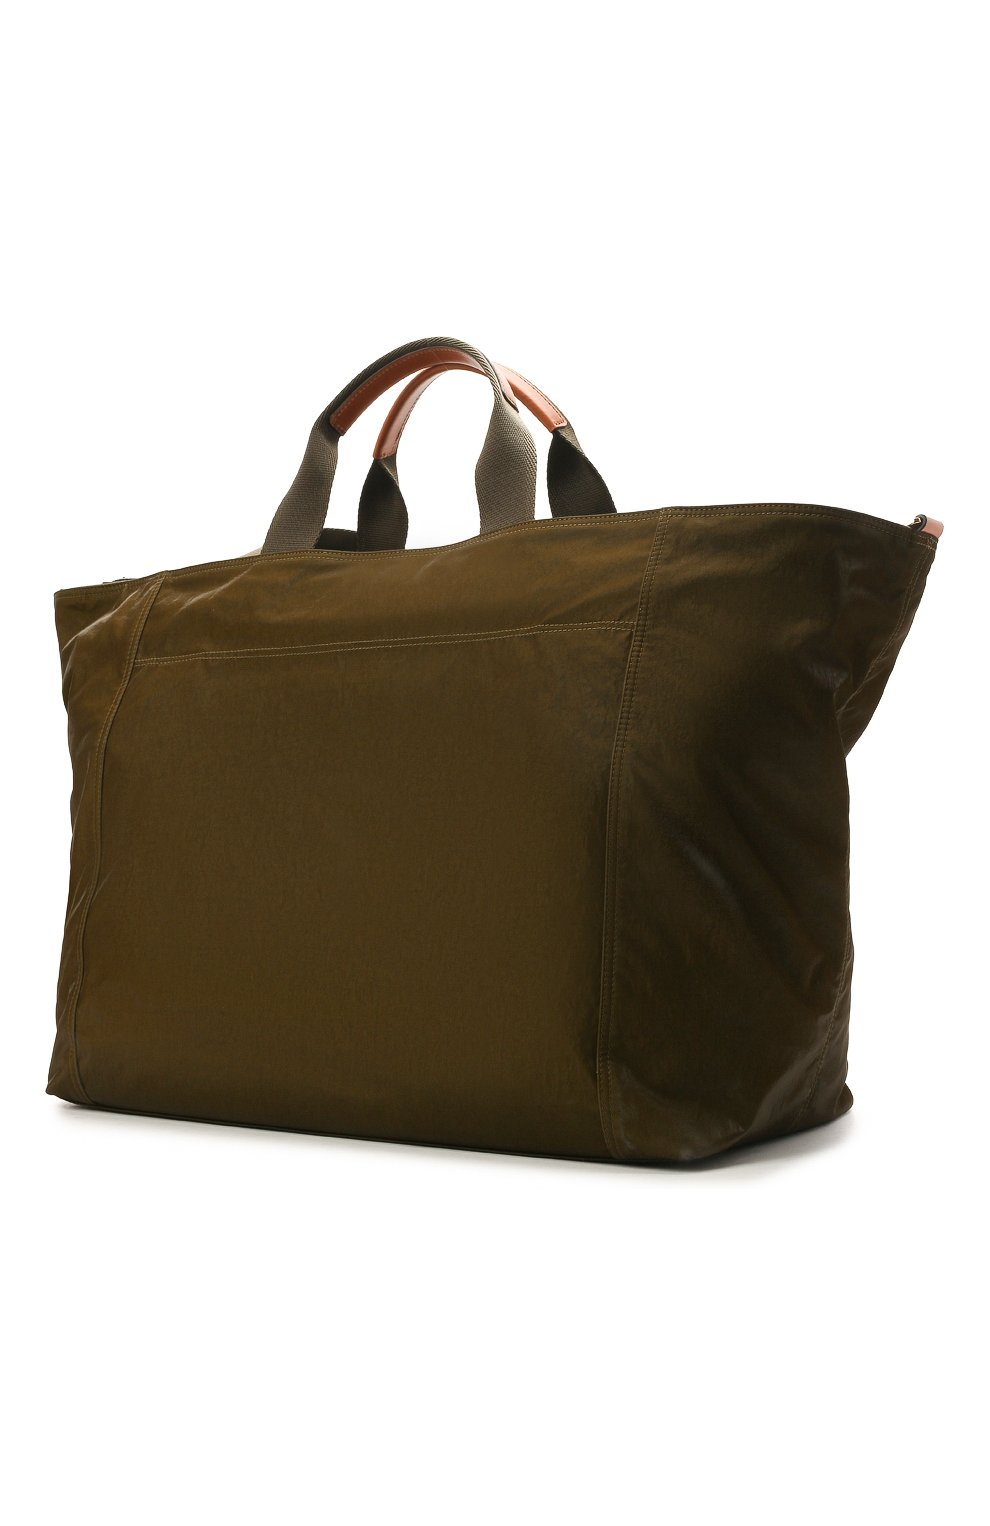 Мужская дорожная сумка nero sicilia dna DOLCE & GABBANA хаки цвета, арт. BM1958/A0244 | Фото 3